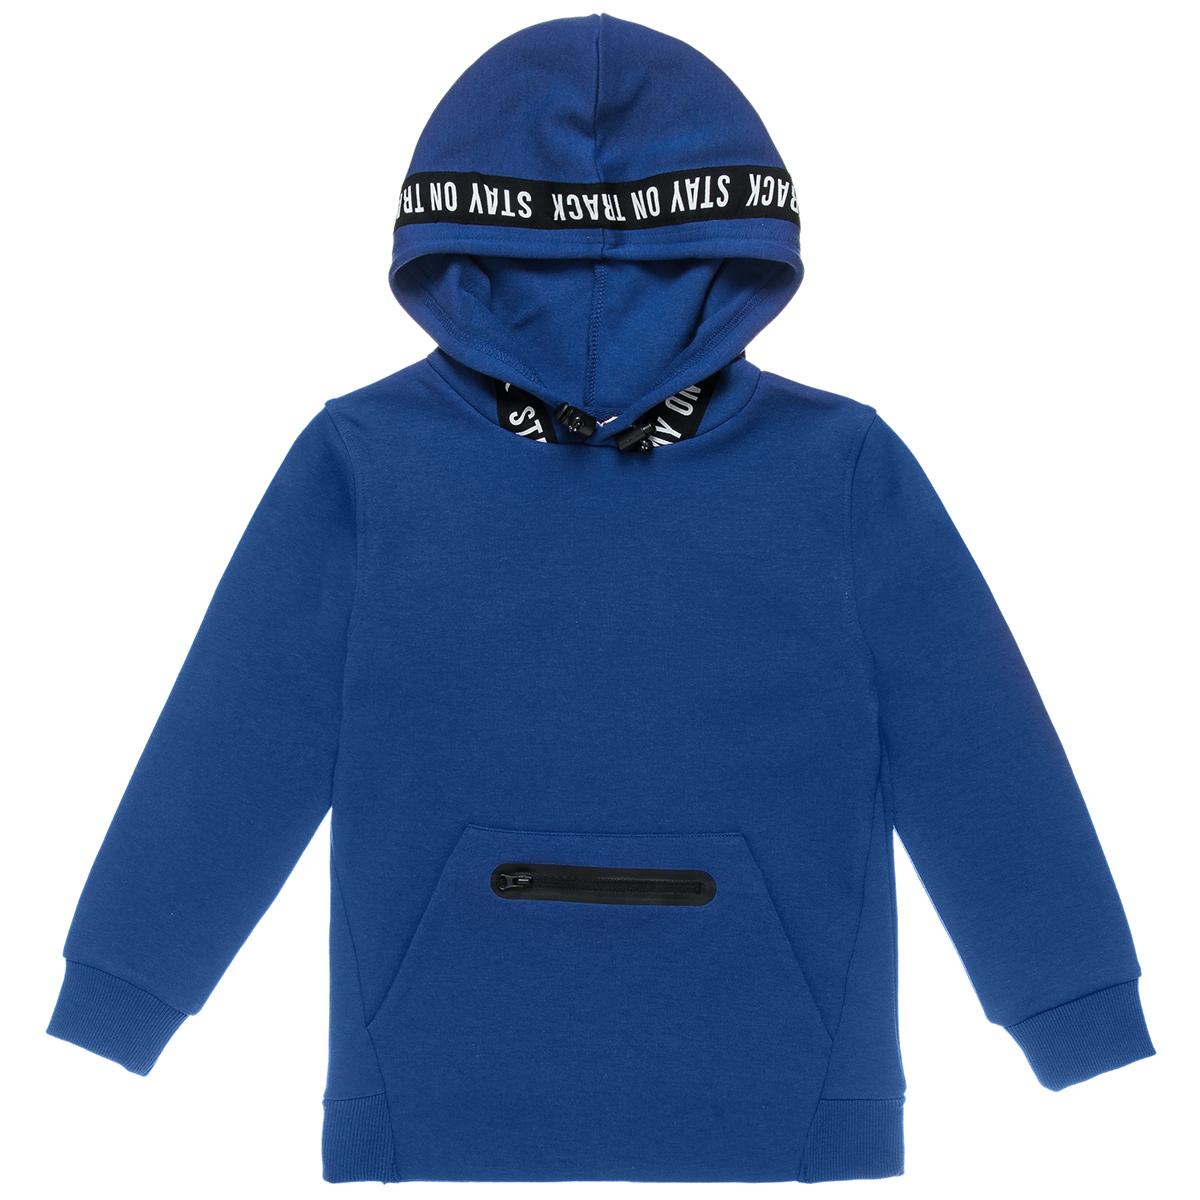 eae3011a7b6 Μπλούζα φουτερ με τσέπες και λεπτομέρεια στην κουκούλα (Αγόρι 6-16 ετών)  00922412 - ΜΠΛΕ ΡΟΥΑ - 4640-0009/3/236/111